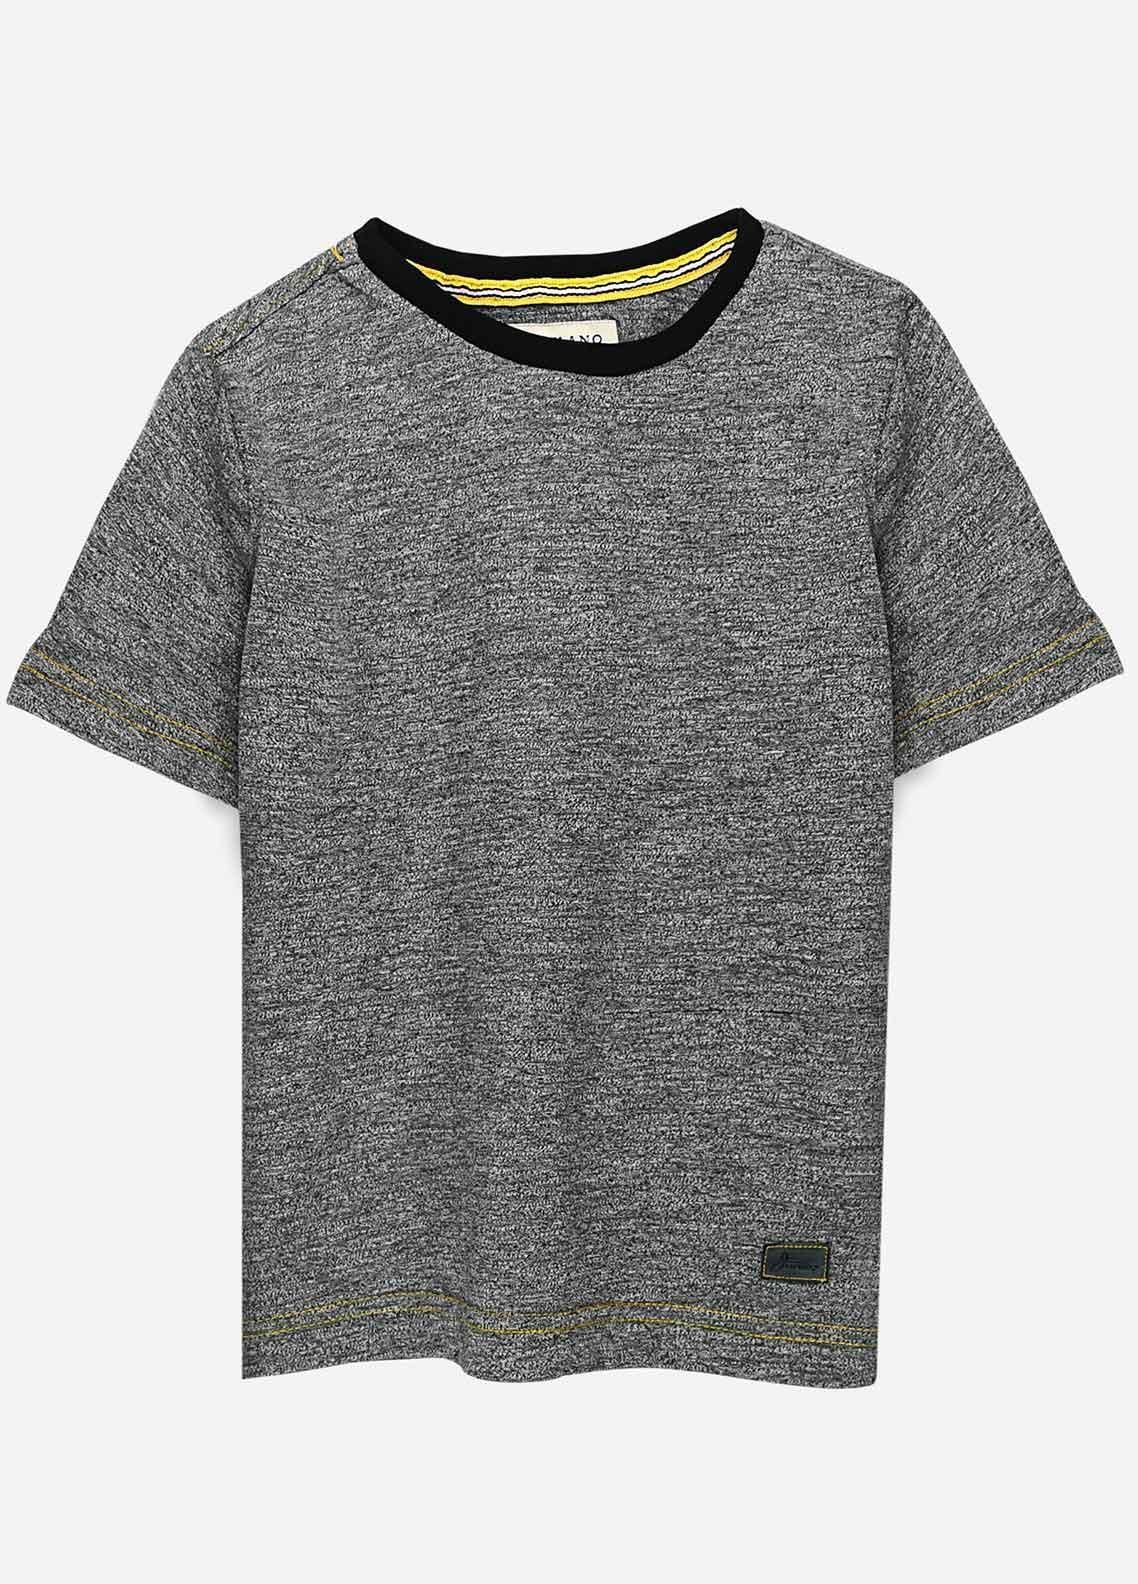 Brumano Cotton Casual T-Shirts for Boys -  BRM21JS Grey Short Sleeves Marl